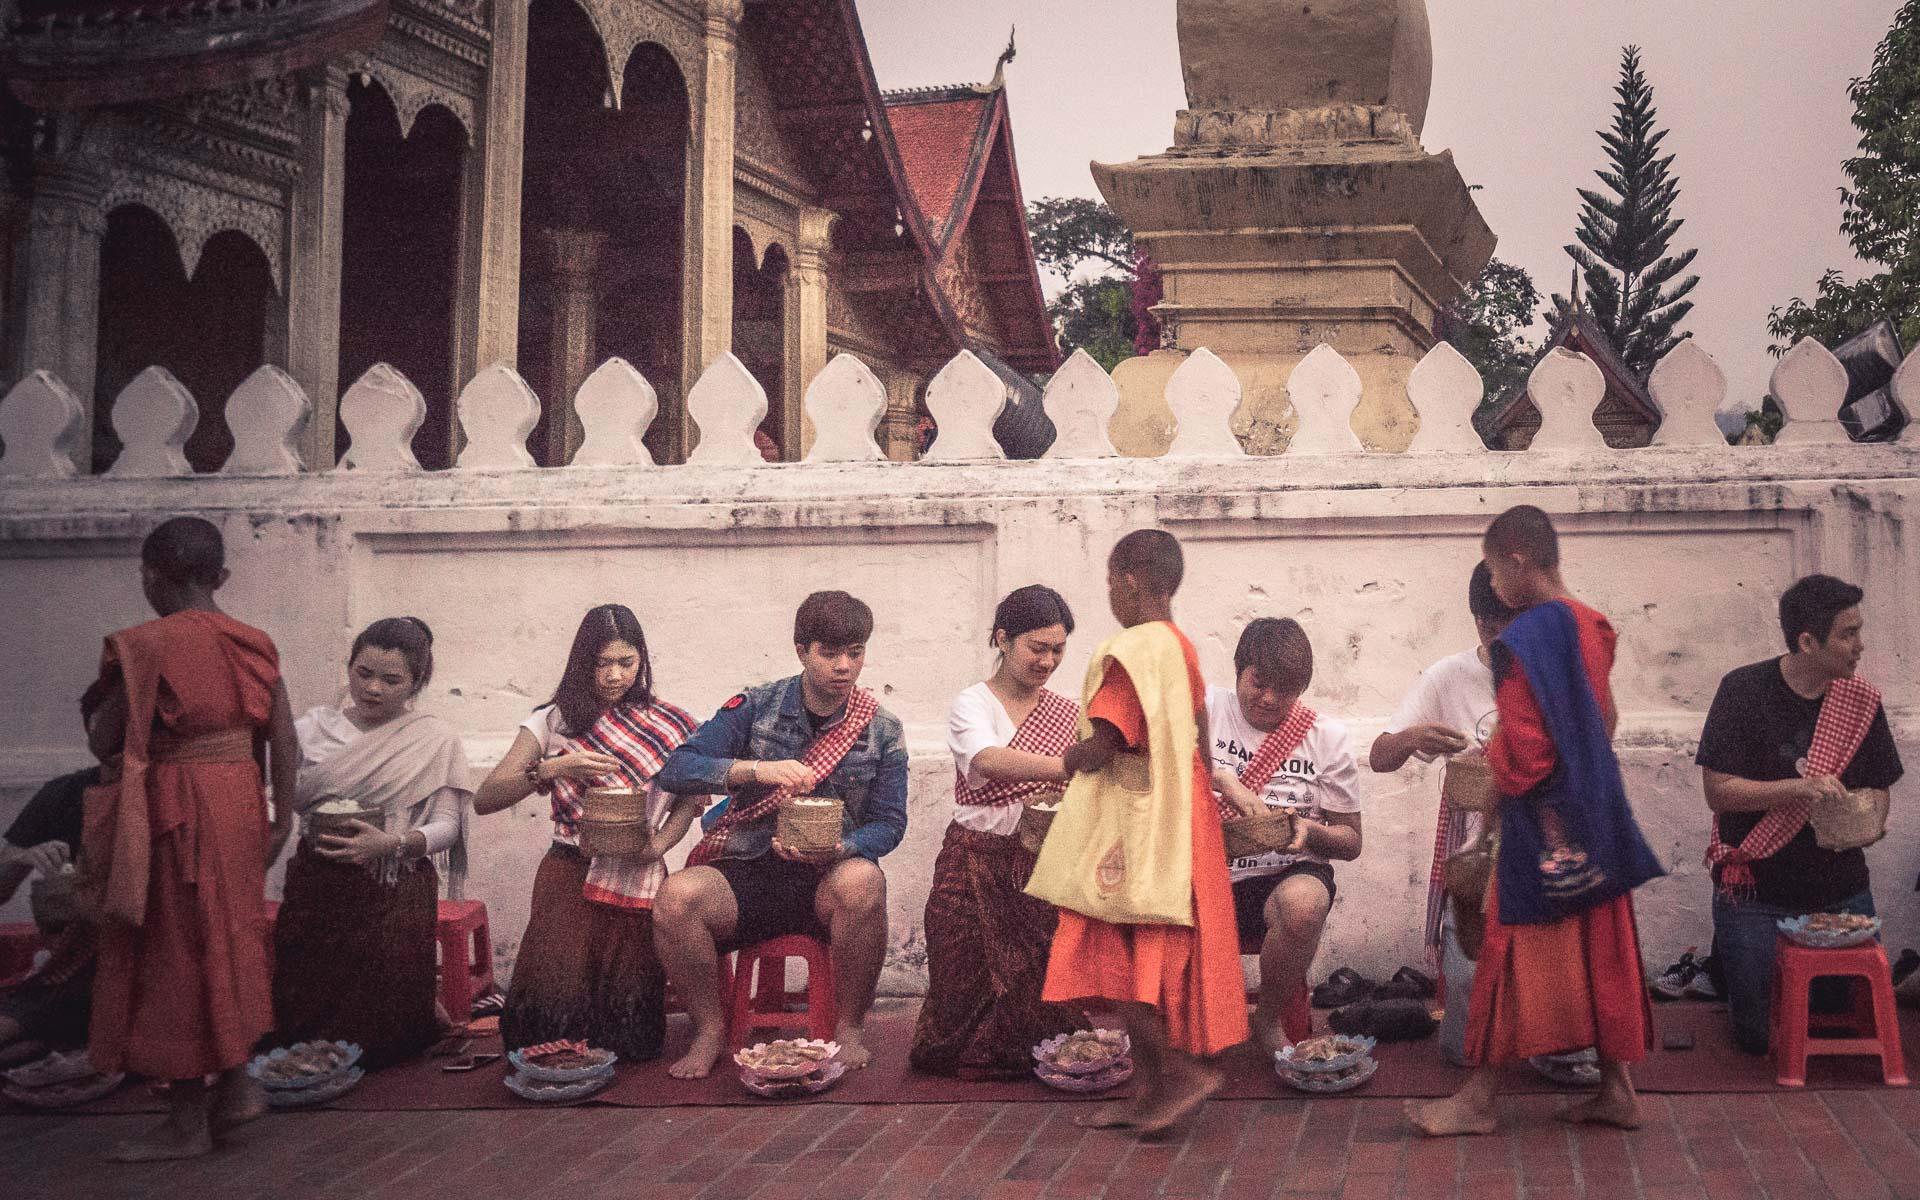 Lesvoyageuses-voyage-laos-luang-prabang-ceremonie-offrandes-6